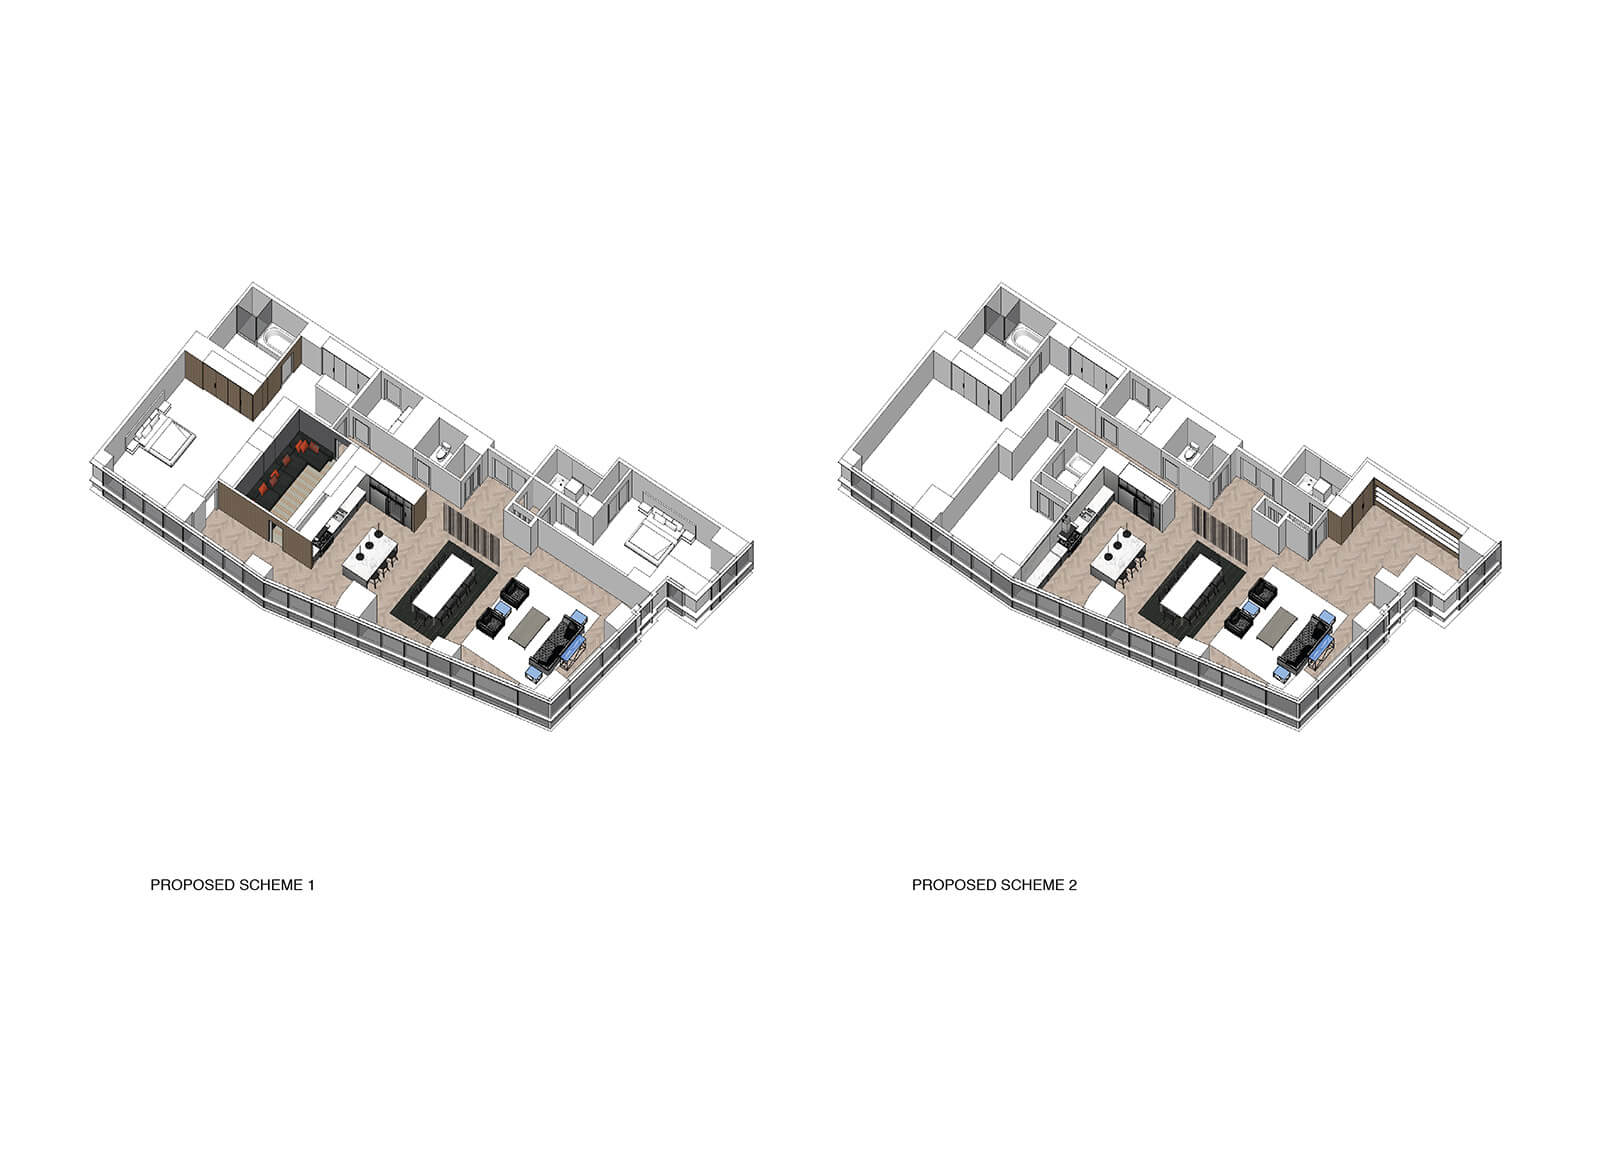 studio vara residential four seasons drawing scheme